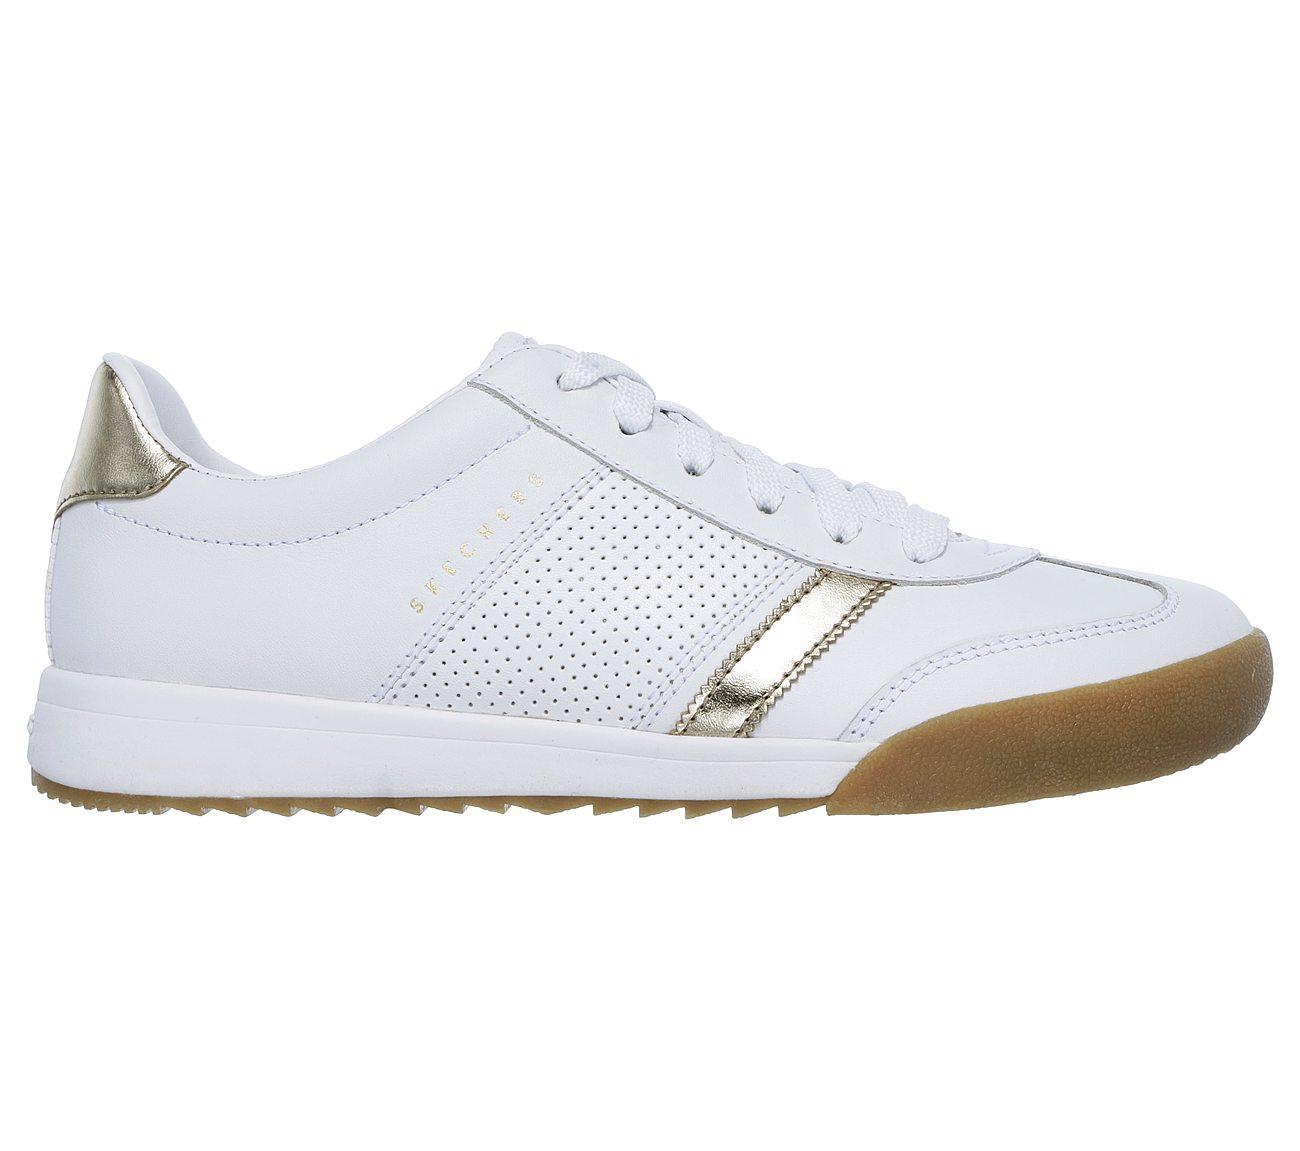 a9bb667d6612 Buy SKECHERS Zinger - Flicker SKECHER Street Shoes only  60.00